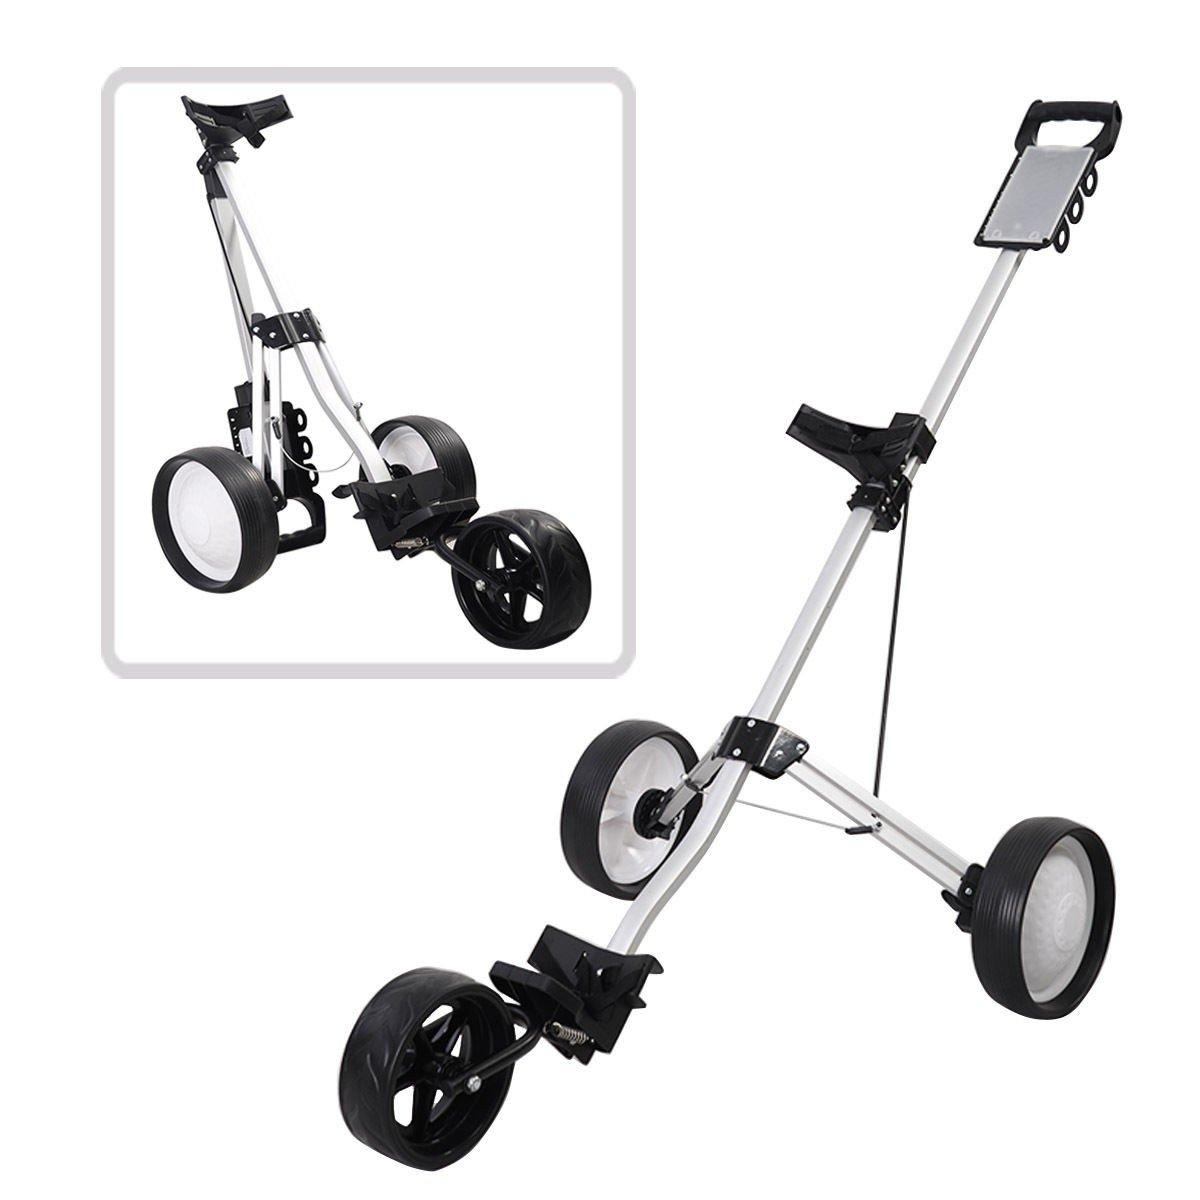 MD Group Golf Cart Push Trolley Pull Wheel Foldable Club Swivel Holder Lightweight Aluminum